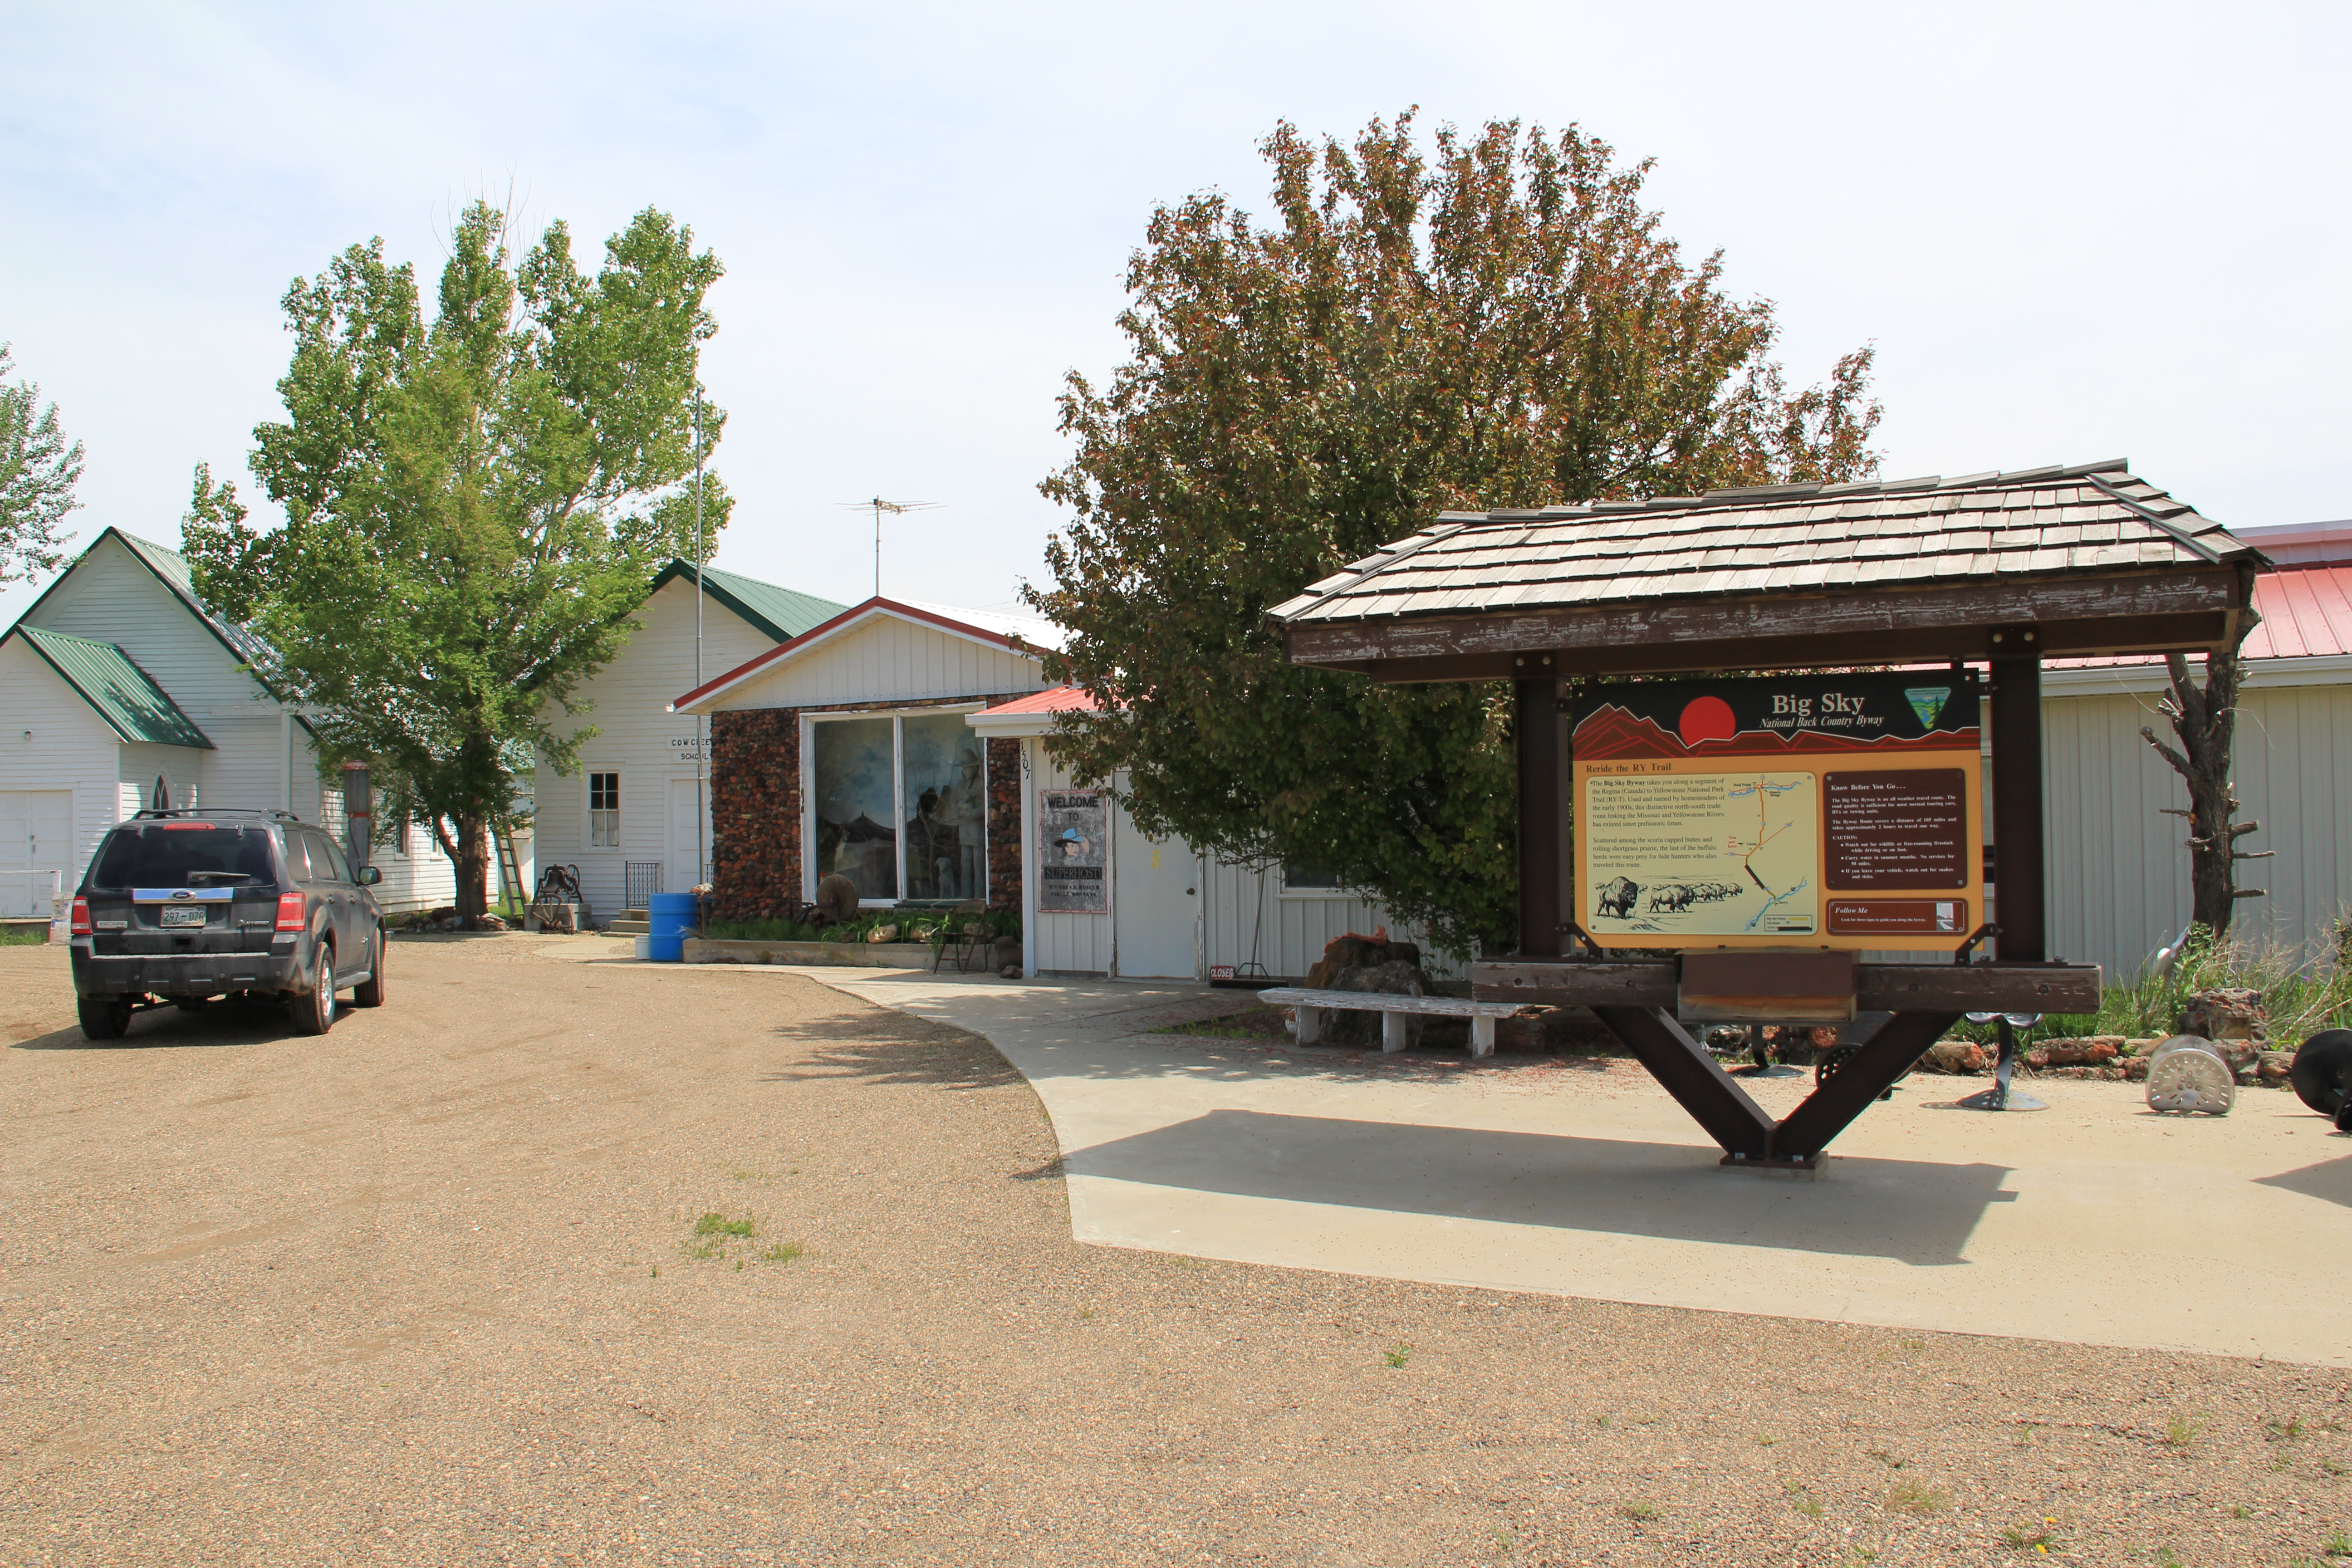 Montana mccone county circle - Image